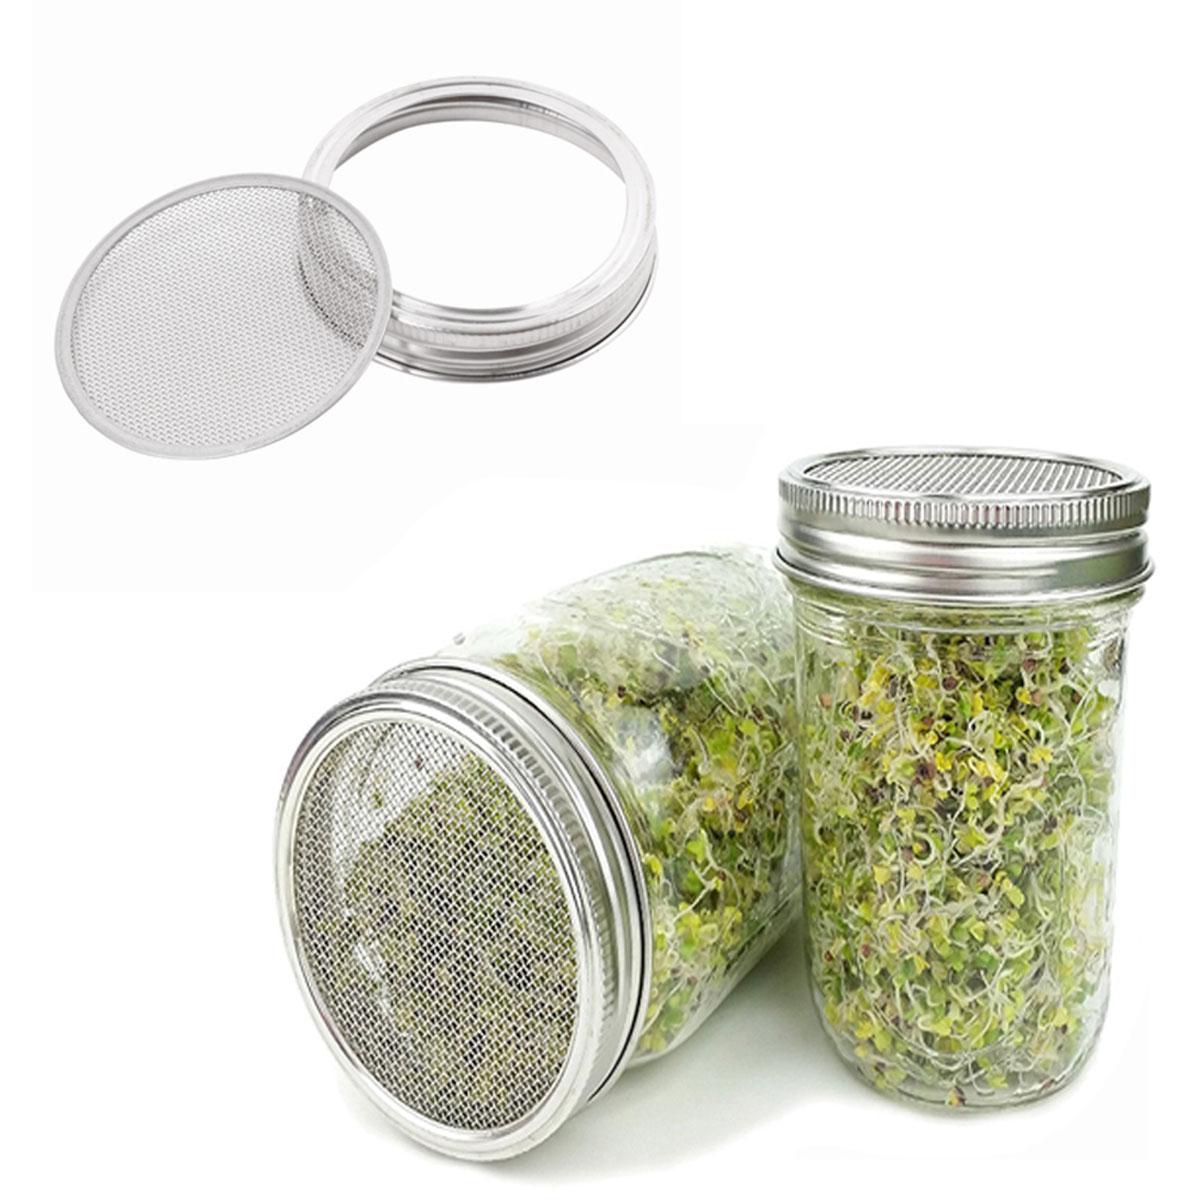 5 uds tapas de brotes de semillas colador conservas tarros de Mason Filtro de tapa de malla filtros criba de acero inoxidable para tamizar harina azúcar en polvo